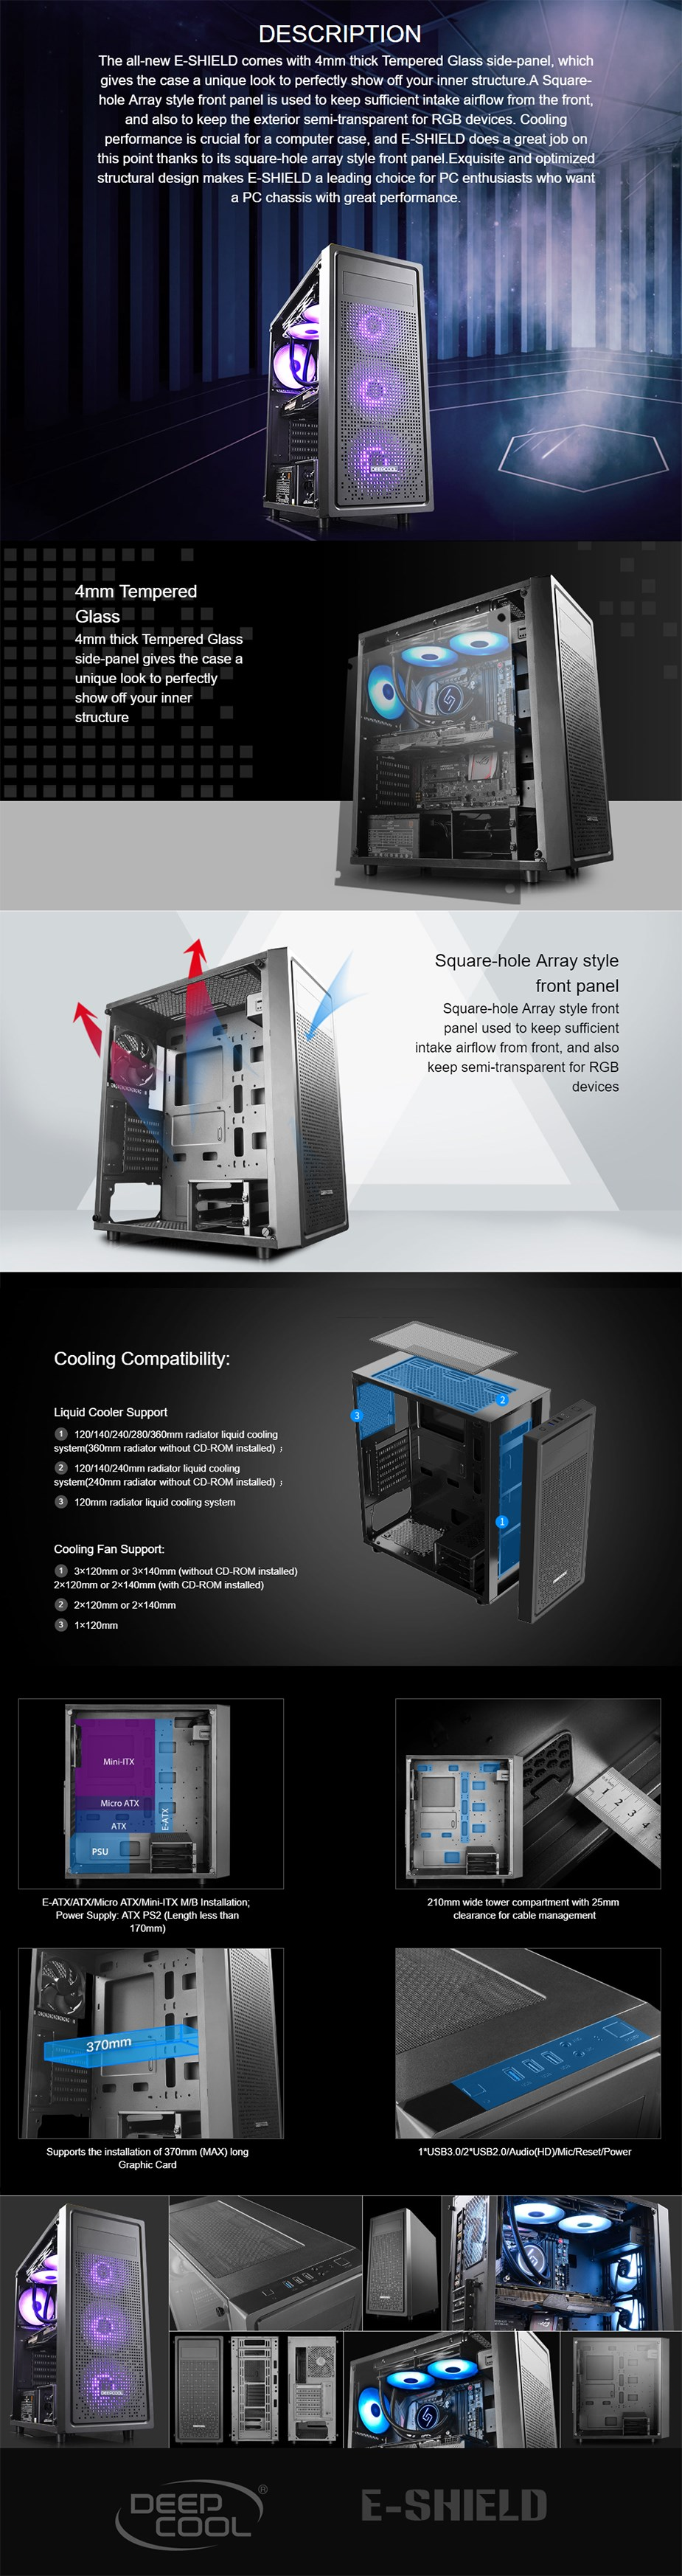 Deepcool E-SHIELD Tempered Glass Mid-Tower E-ATX Case - Desktop Overview 2